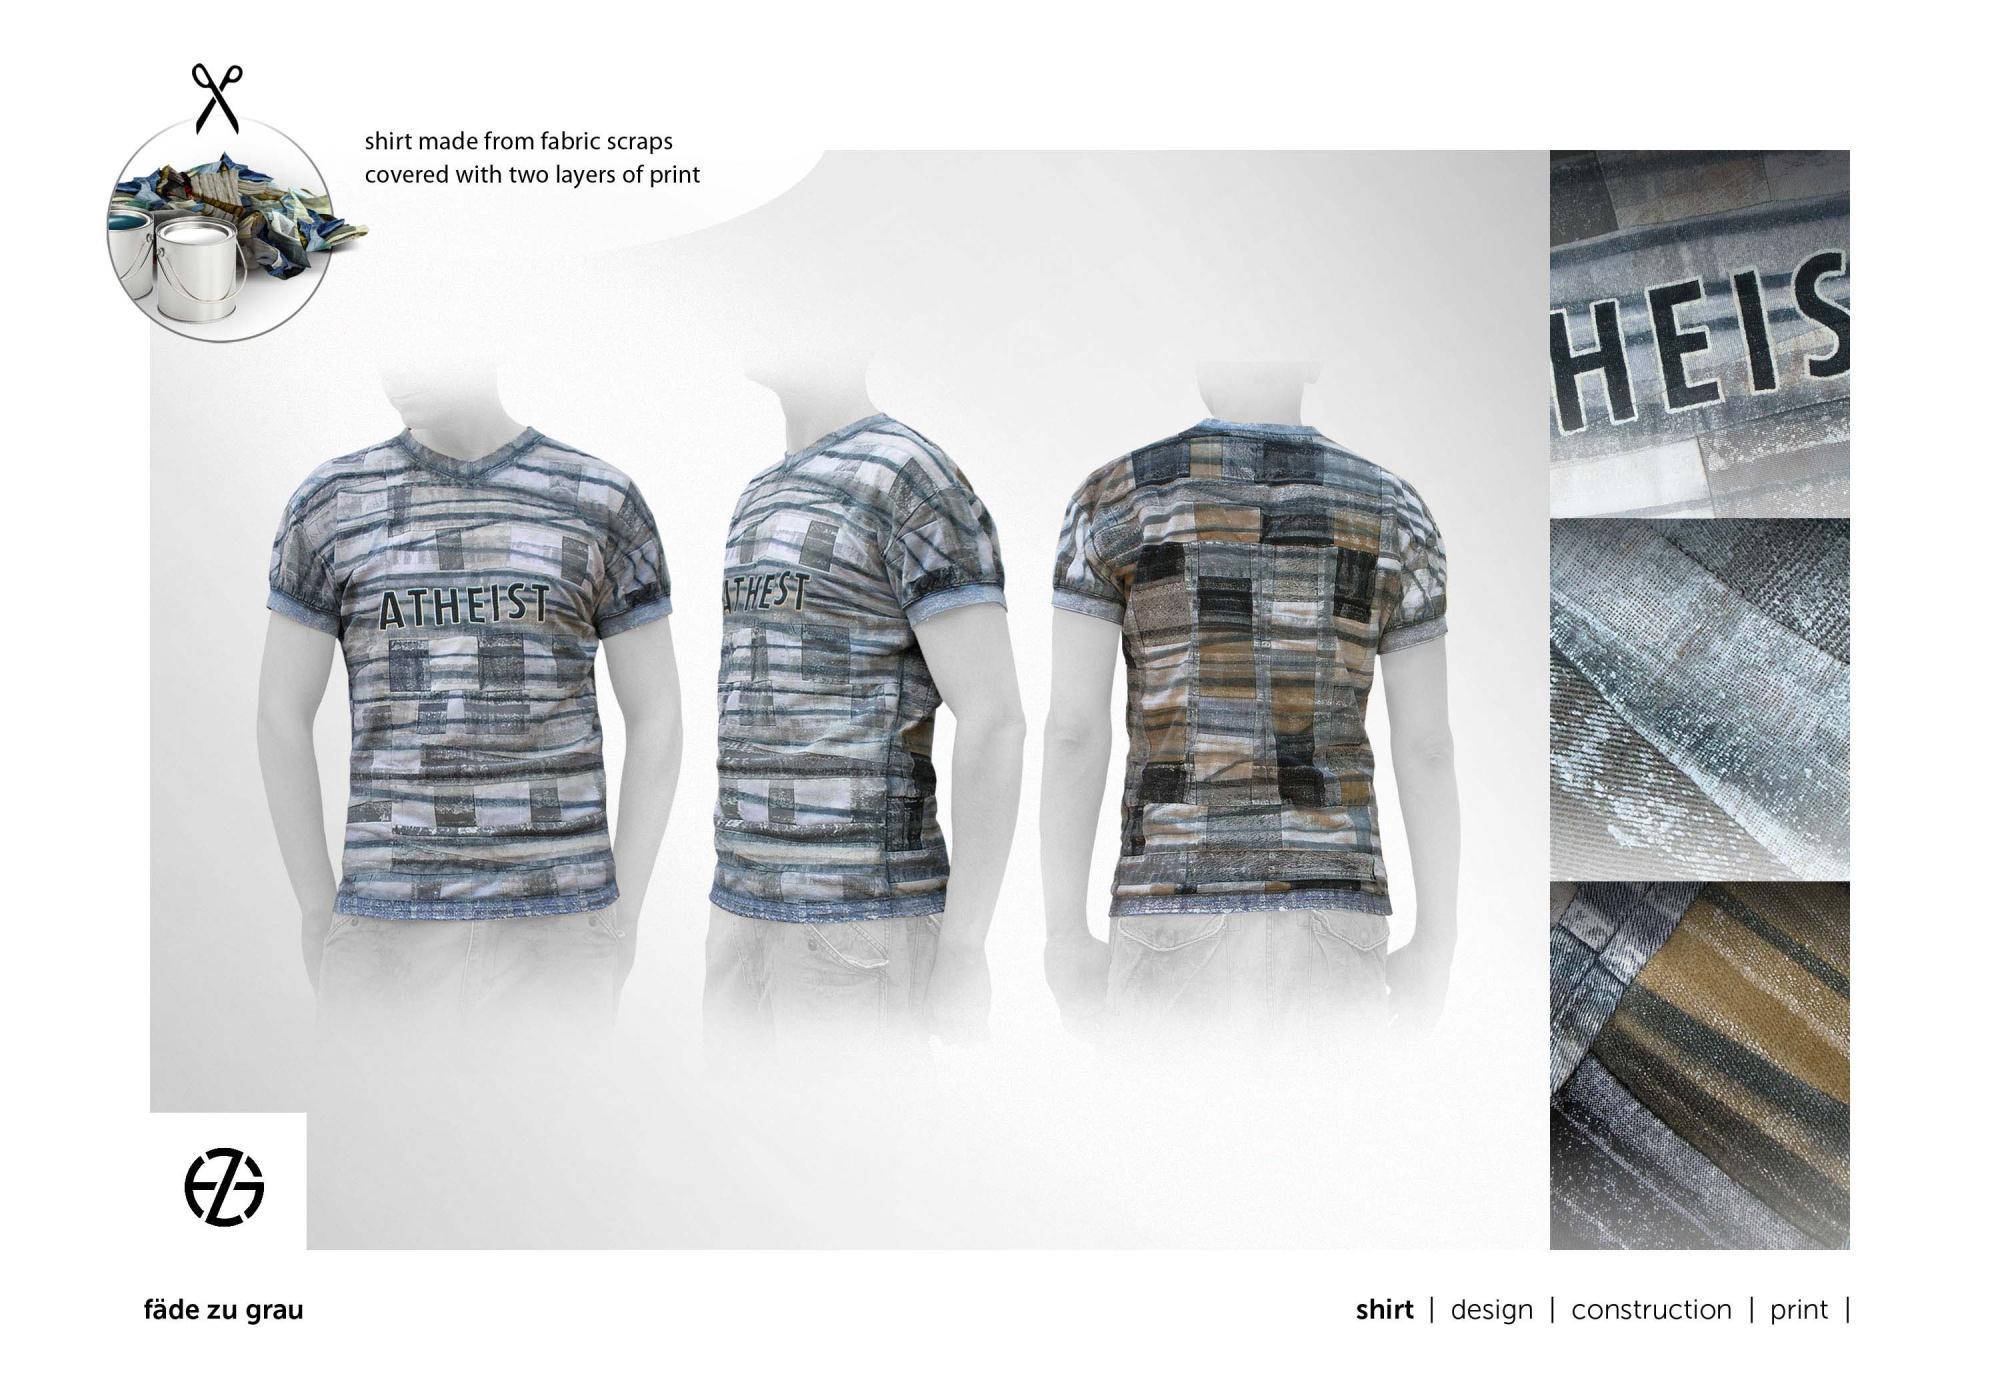 fäde zu grau | shirt 'atheist'